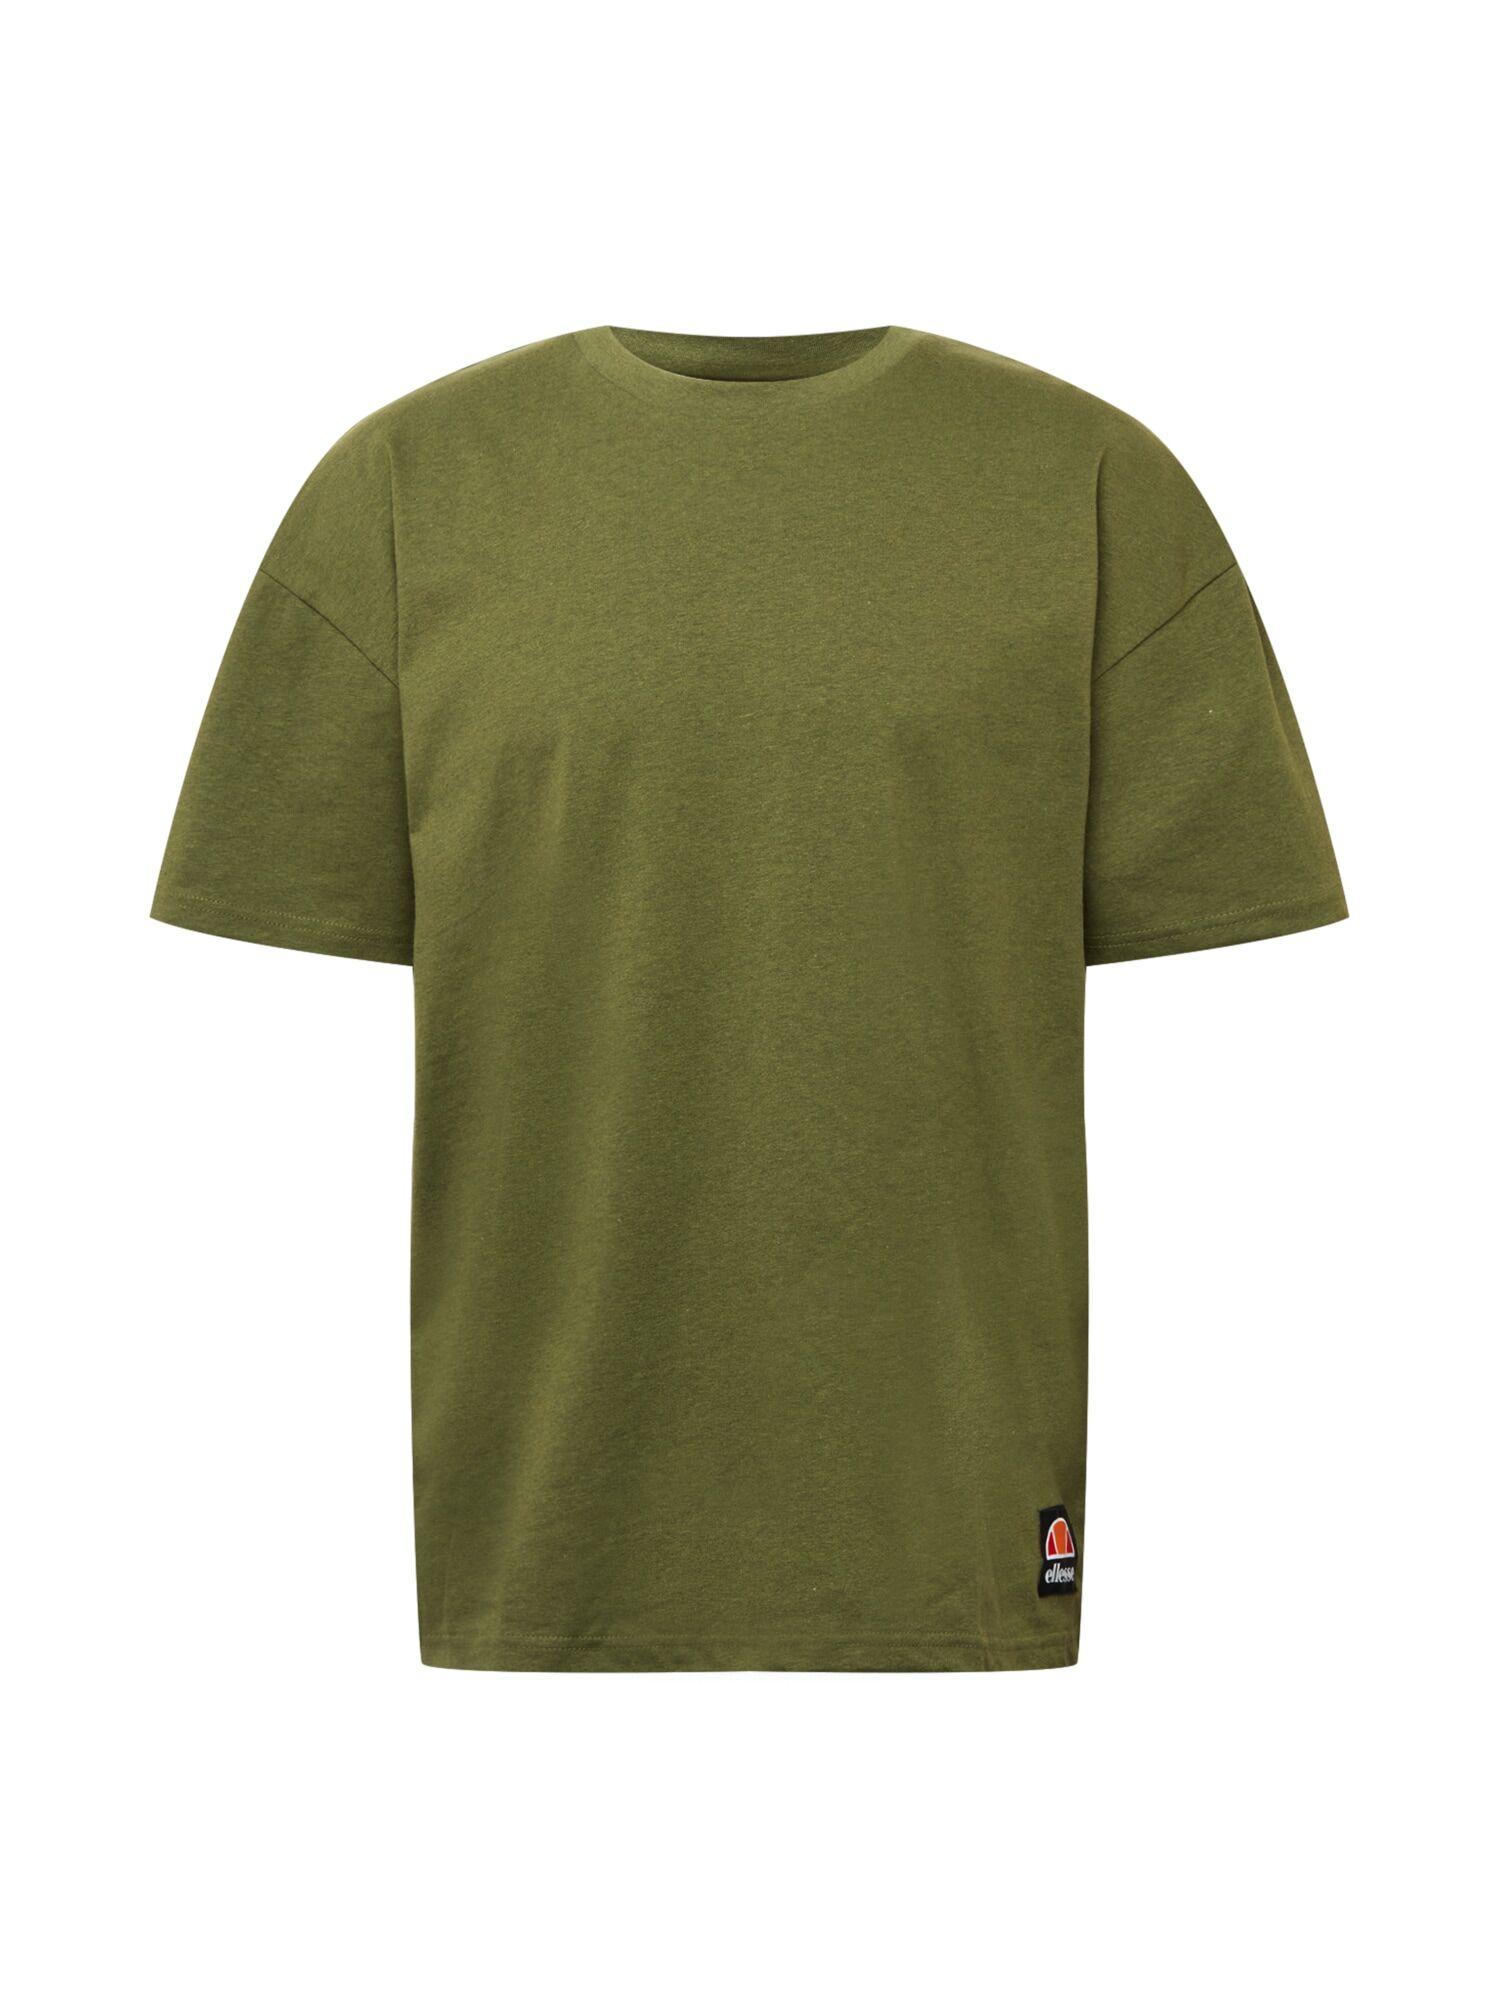 ELLESSE T-Shirt 'Avis'  - Vert - Taille: XS - male